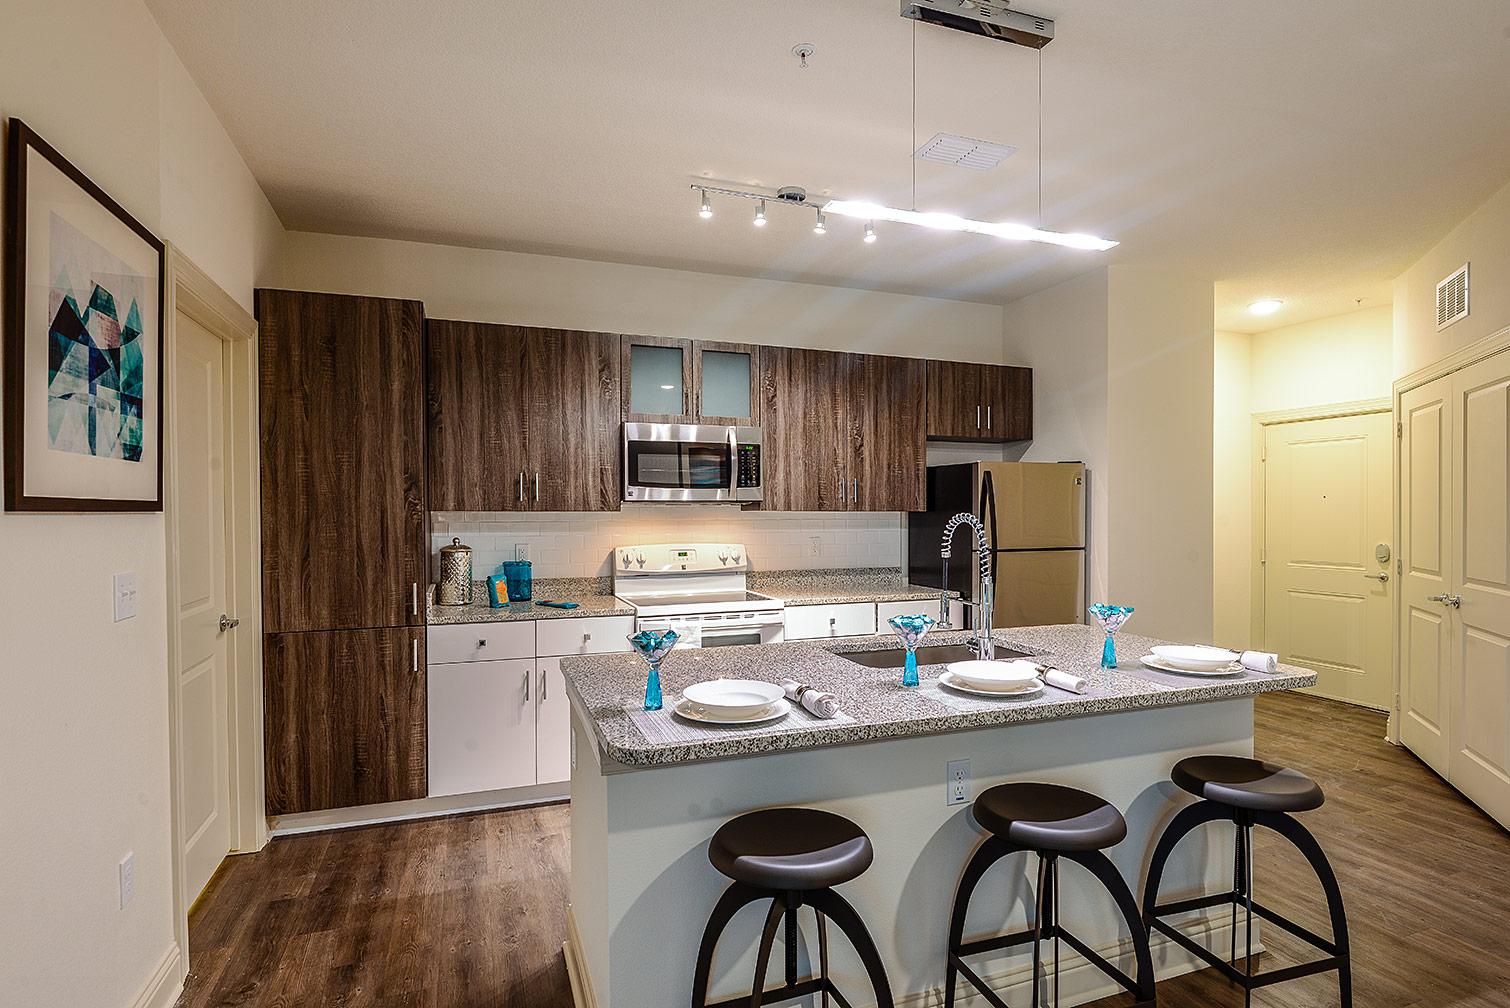 Greystar--EOS-Apartments-8664.jpg